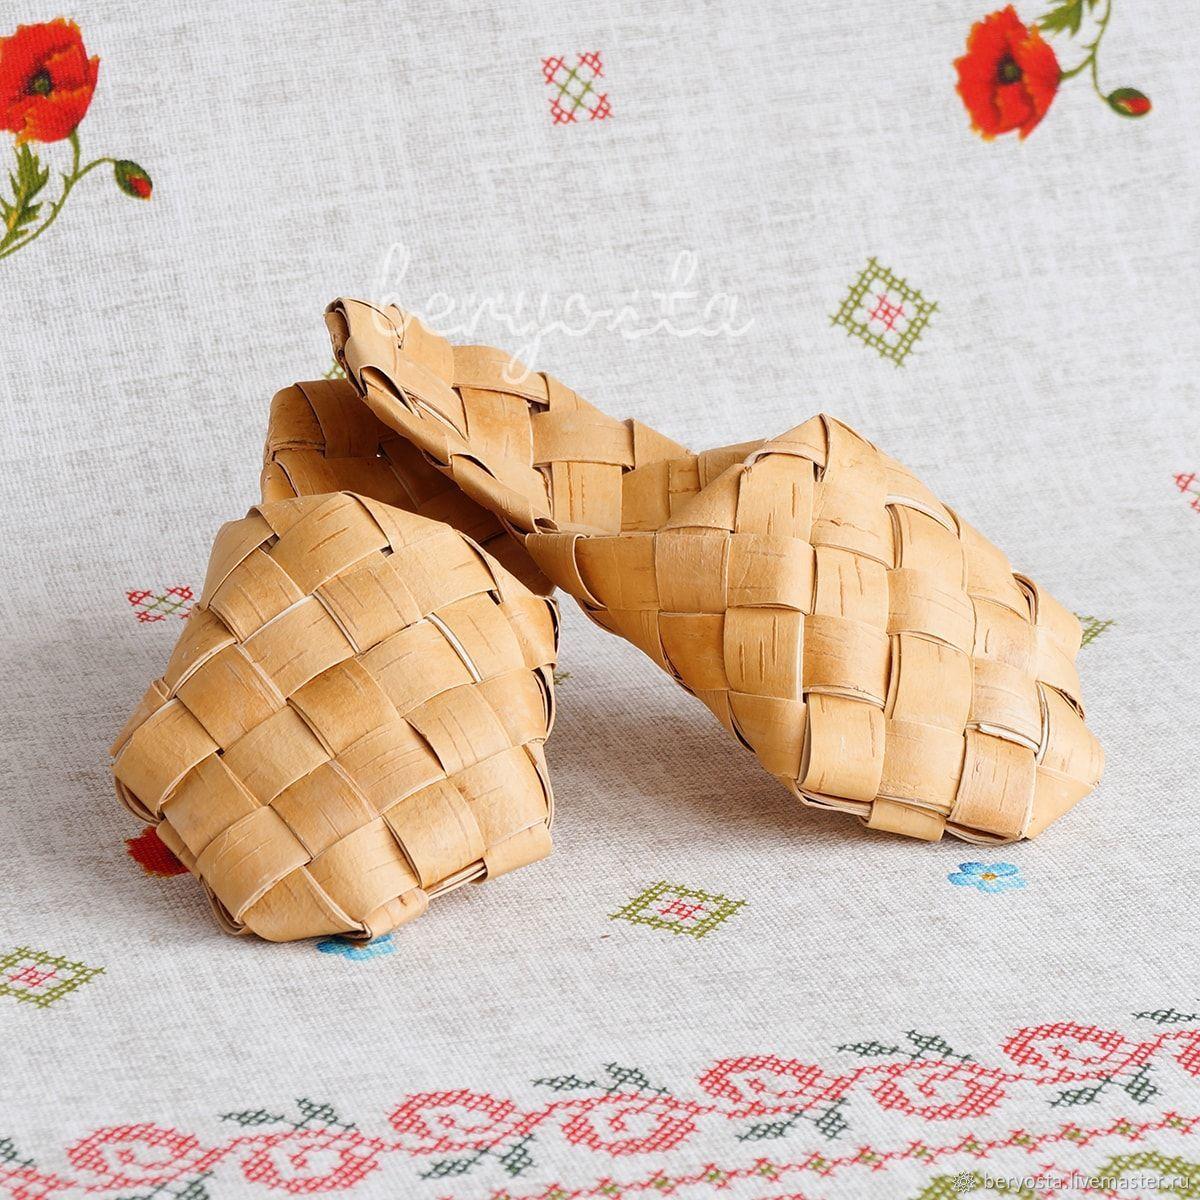 Ступни (тапки, шлёпки) из бересты, р-р 34-45. Обувь для бани, Тапочки, Новосибирск,  Фото №1